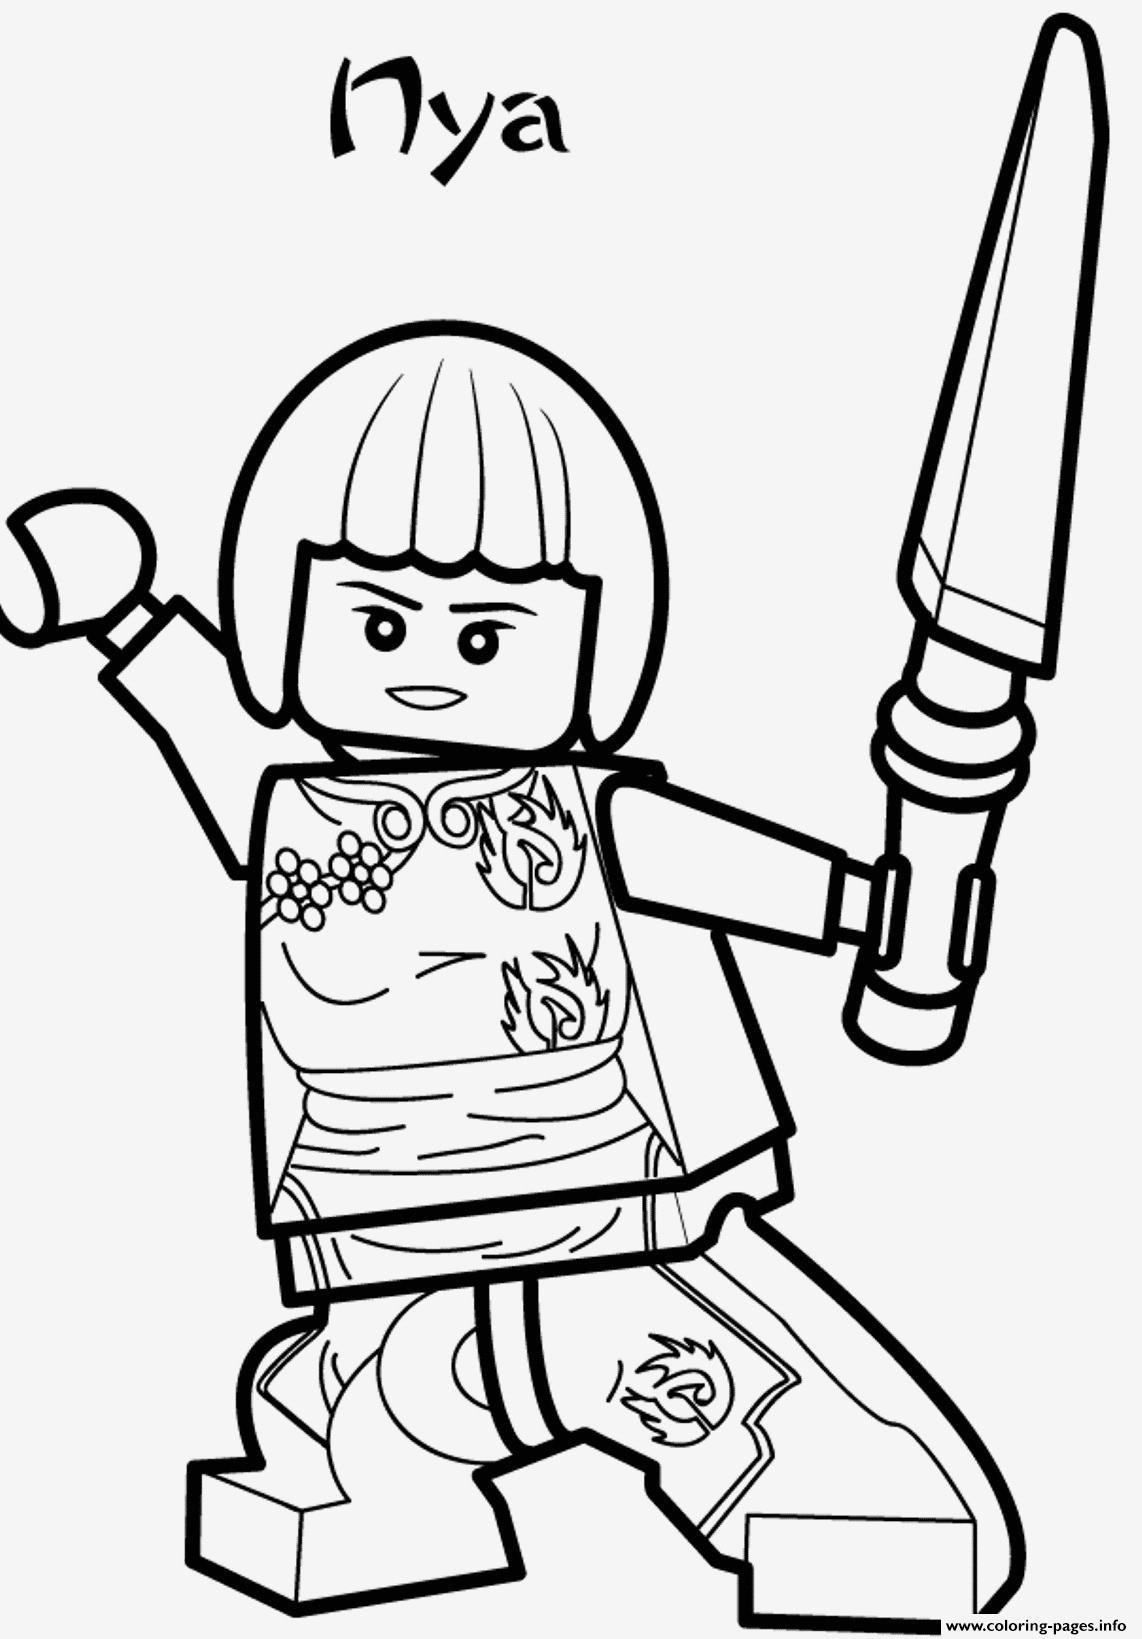 Lego Ninjago Malvorlage Frisch Lego Ninjago Ausmalbild Bilder Zum Ausmalen Bekommen Ninjago Jay Das Bild